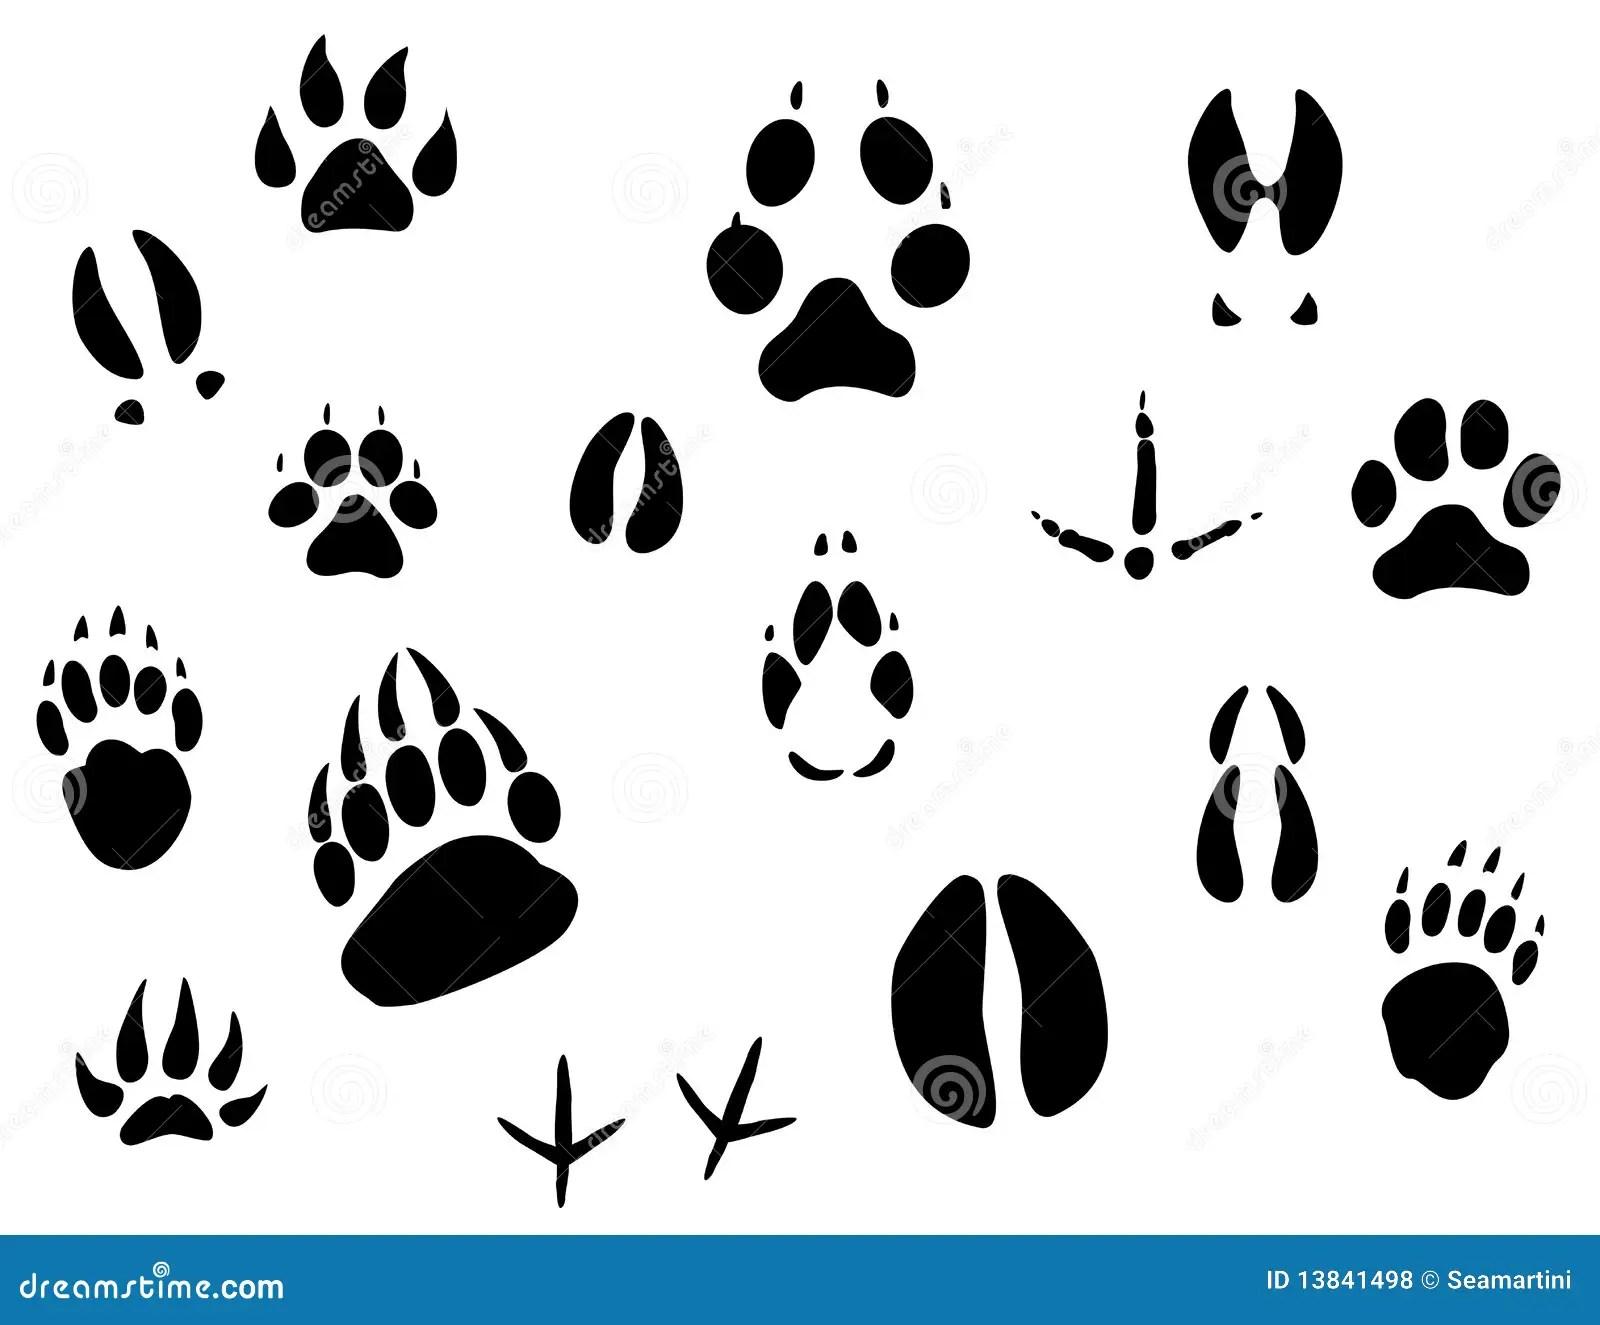 Animal footprints stock vector. Illustration of icon